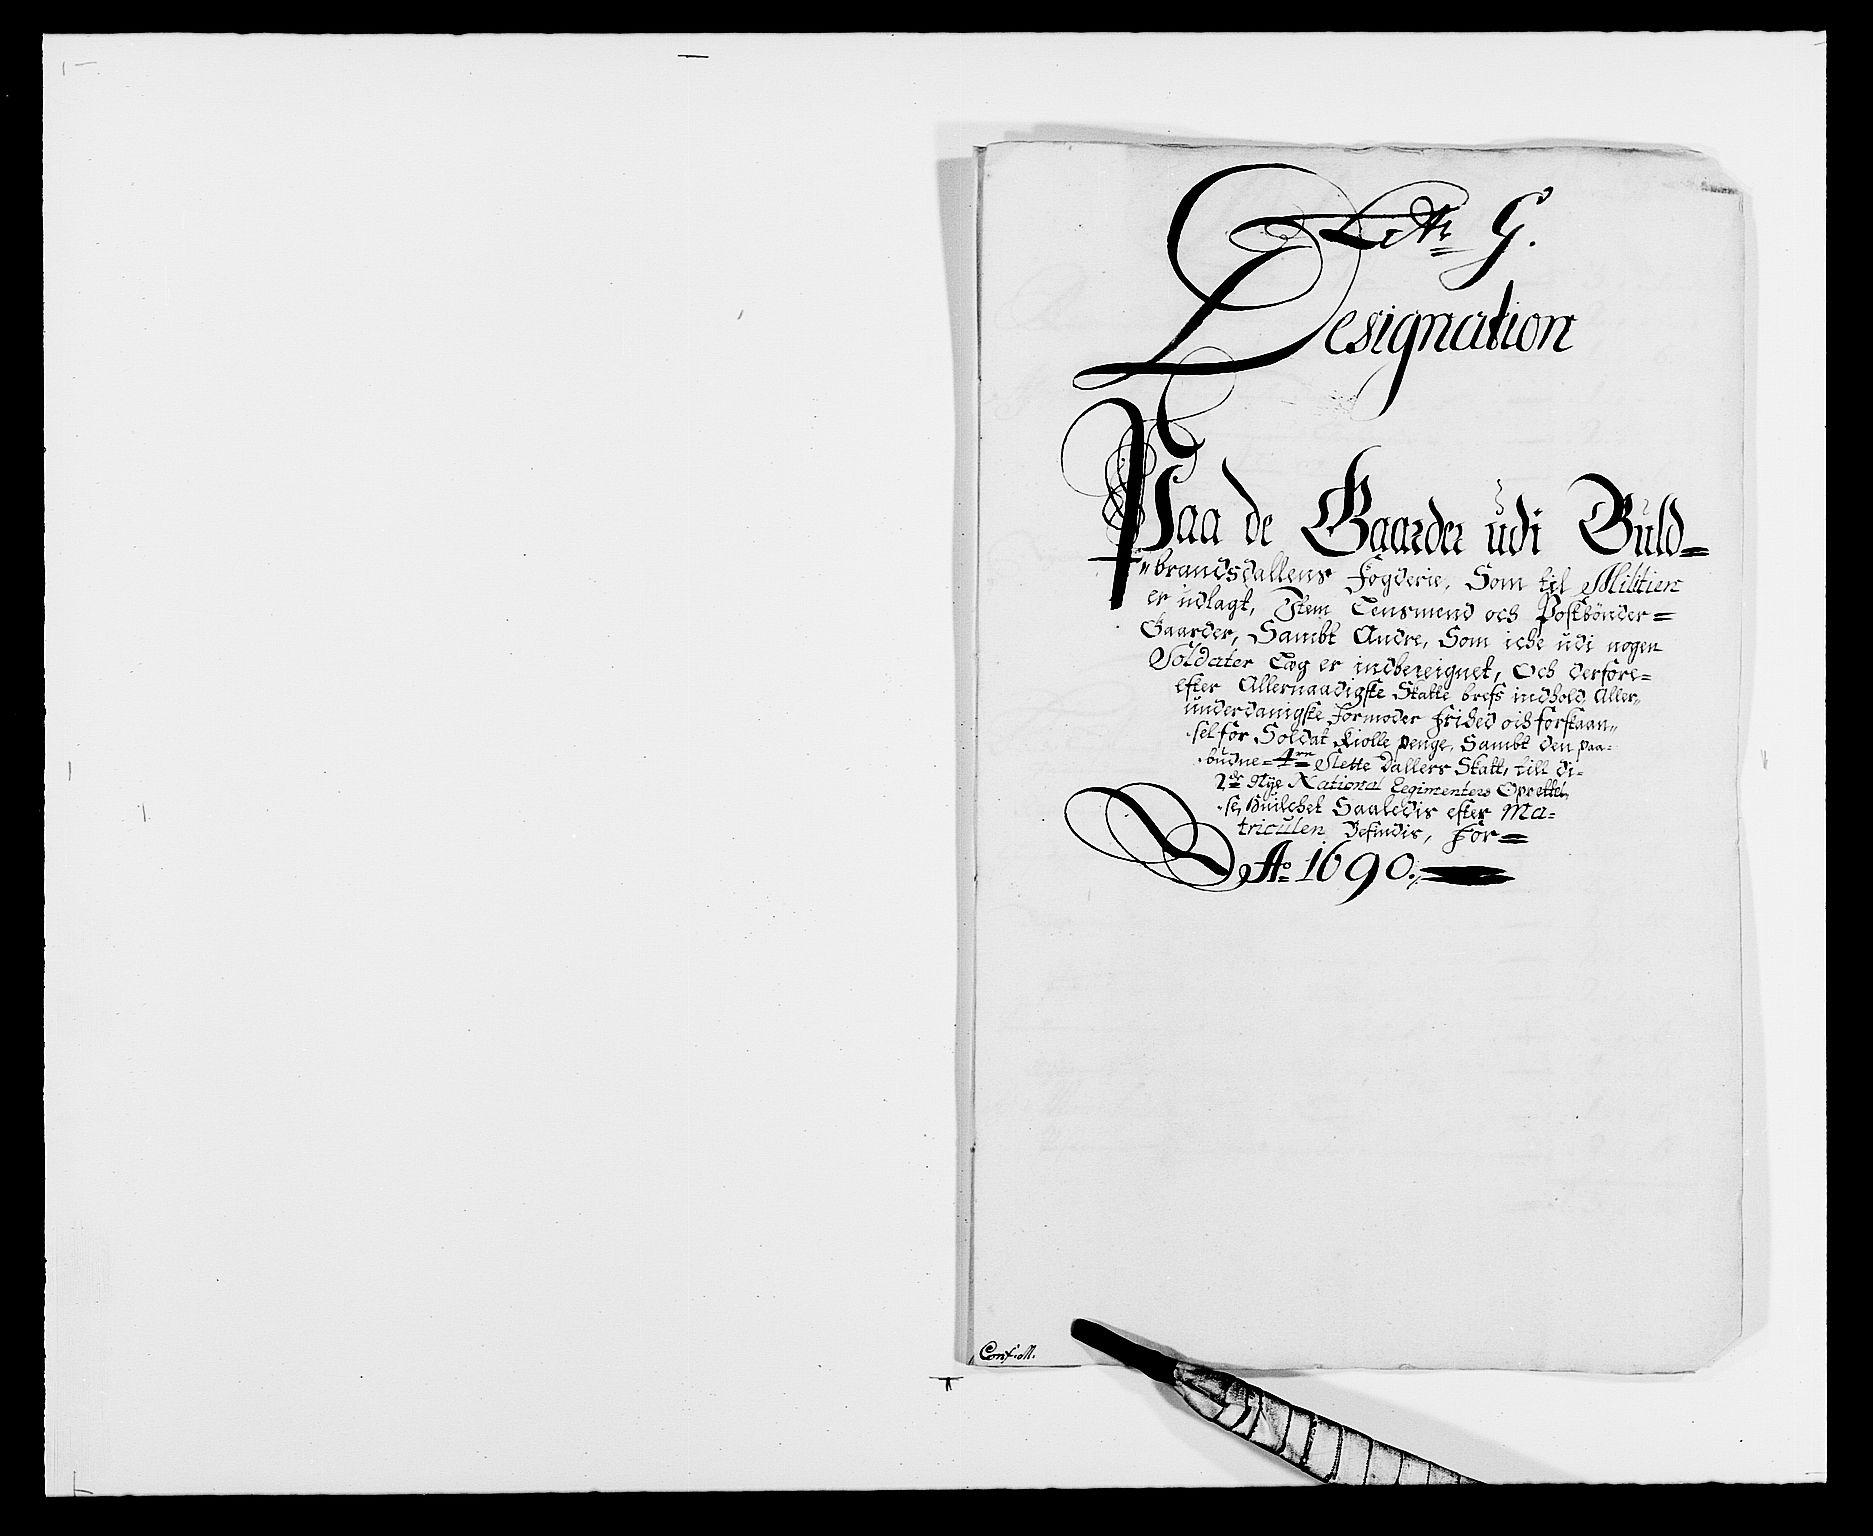 RA, Rentekammeret inntil 1814, Reviderte regnskaper, Fogderegnskap, R17/L1165: Fogderegnskap Gudbrandsdal, 1690-1692, s. 138